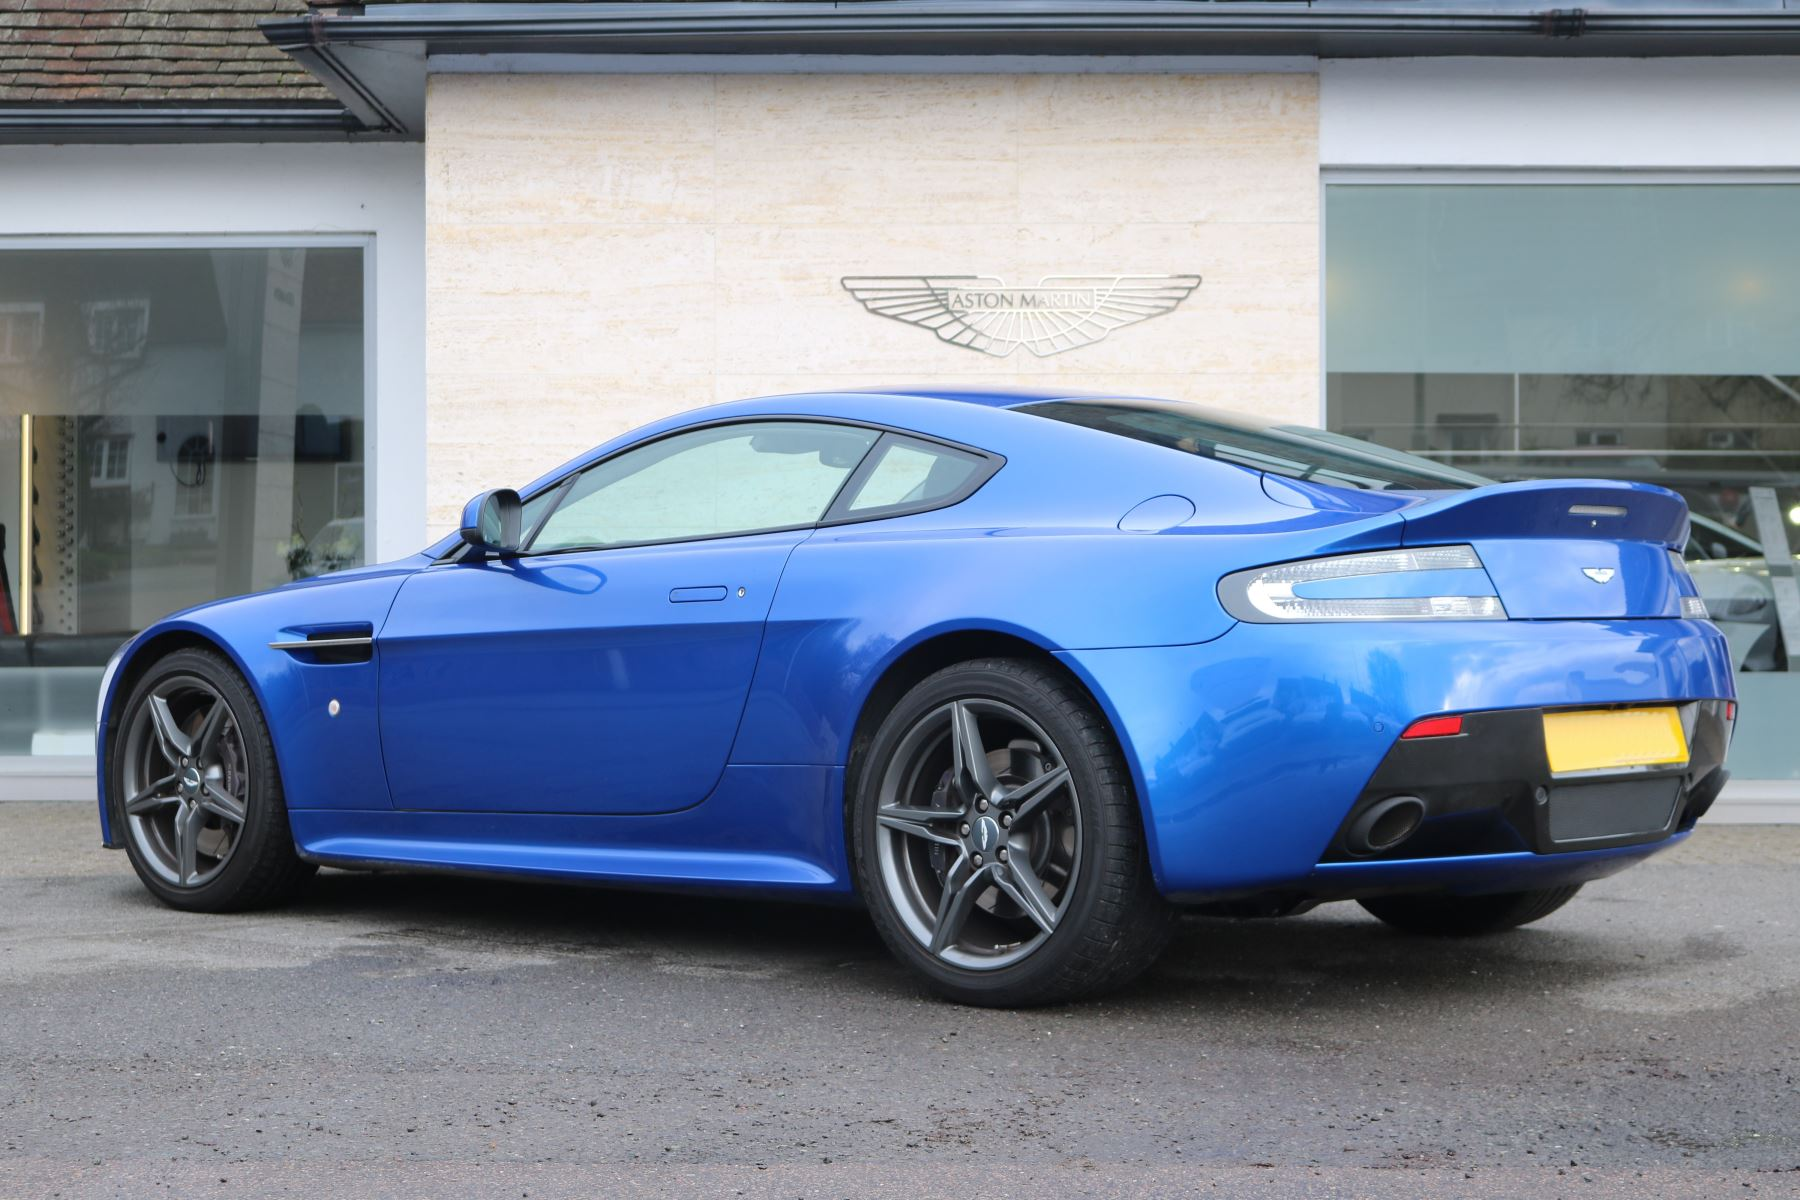 Aston Martin V8 Vantage S S 2dr Sportshift image 7